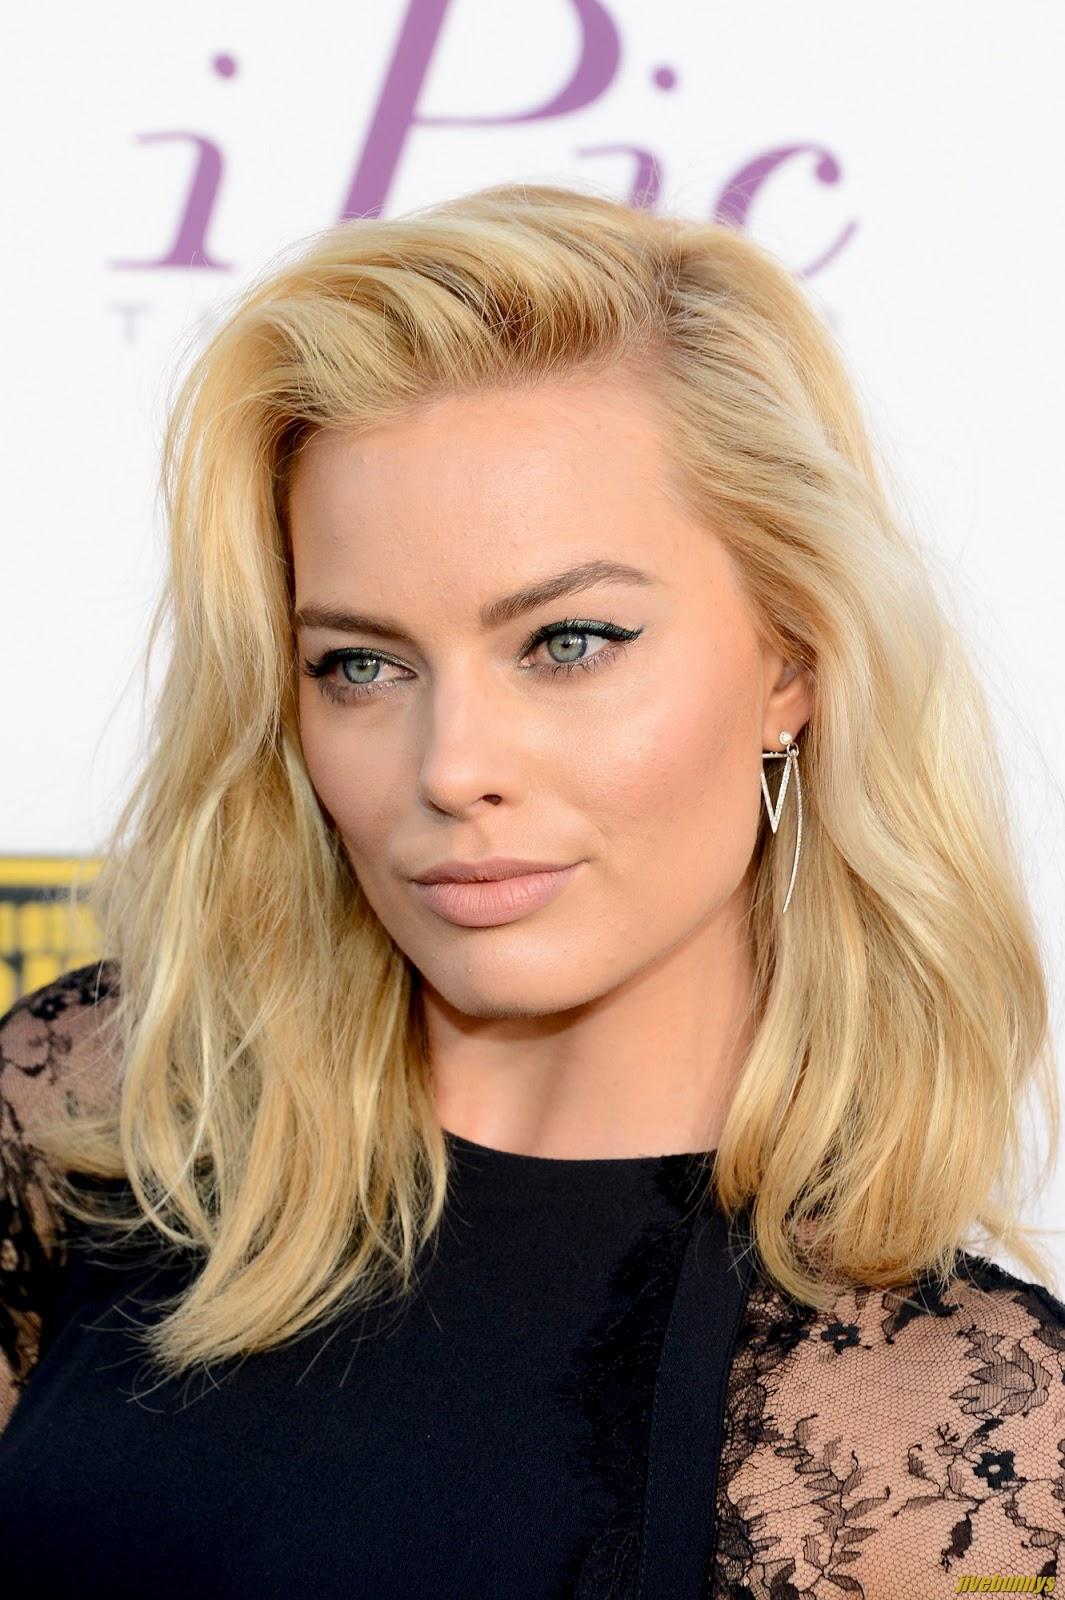 Margot Robbie Actress Photos Gallery 2